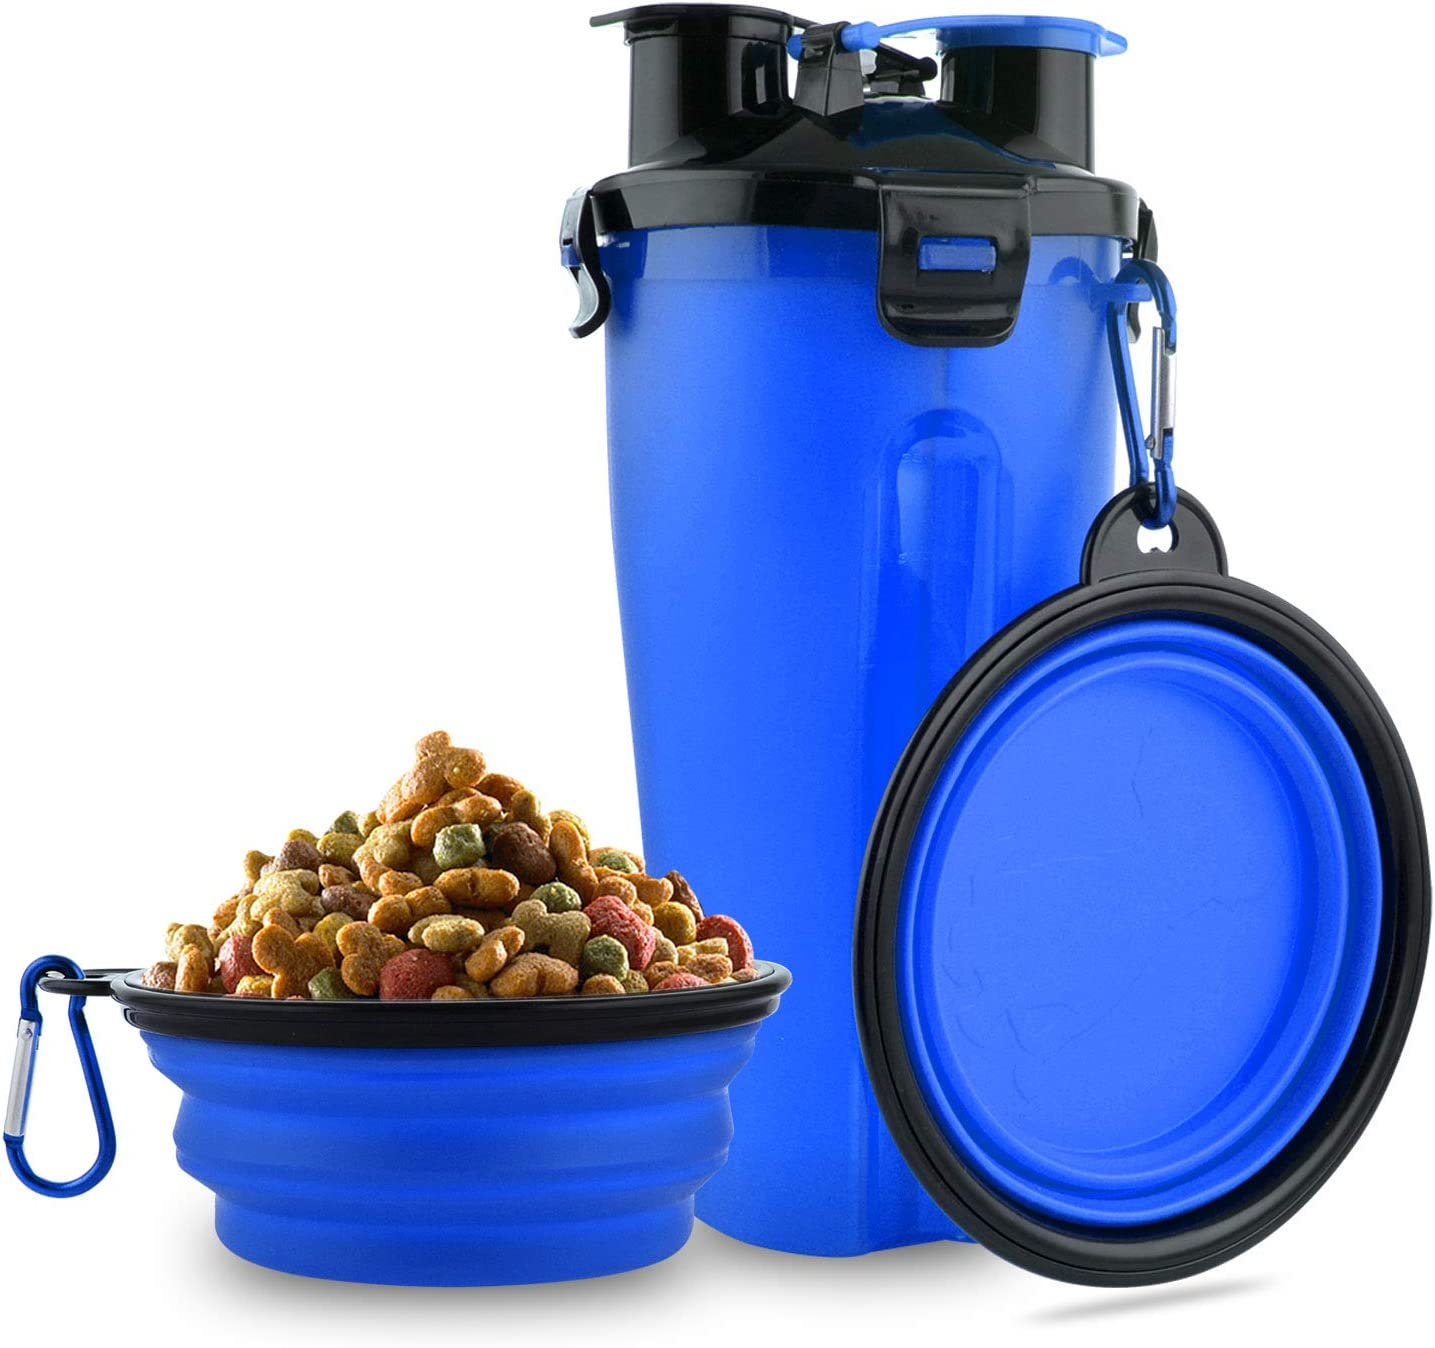 MATT SAGA Botella de Agua para Perros Portatil Envase de Comida para Perros con 2 Plegable Tazones para Perros Gatos Mascotas Adecuado para al Aire Libre Caminar Viajar (Azul)